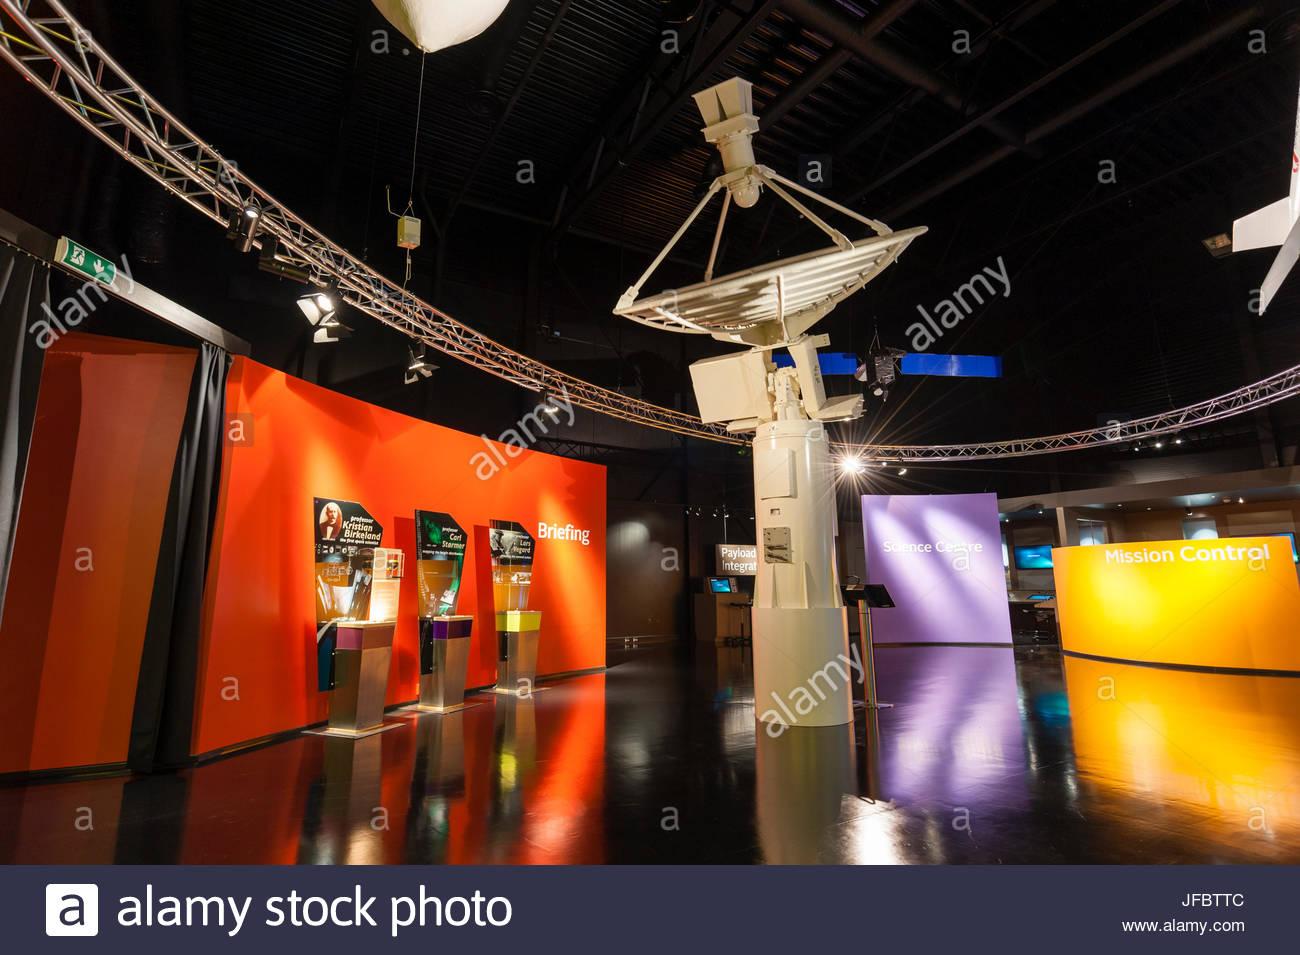 Satellite dish and displays at Spaceship Aurora, at the Andoya Rocket Range. - Stock Image